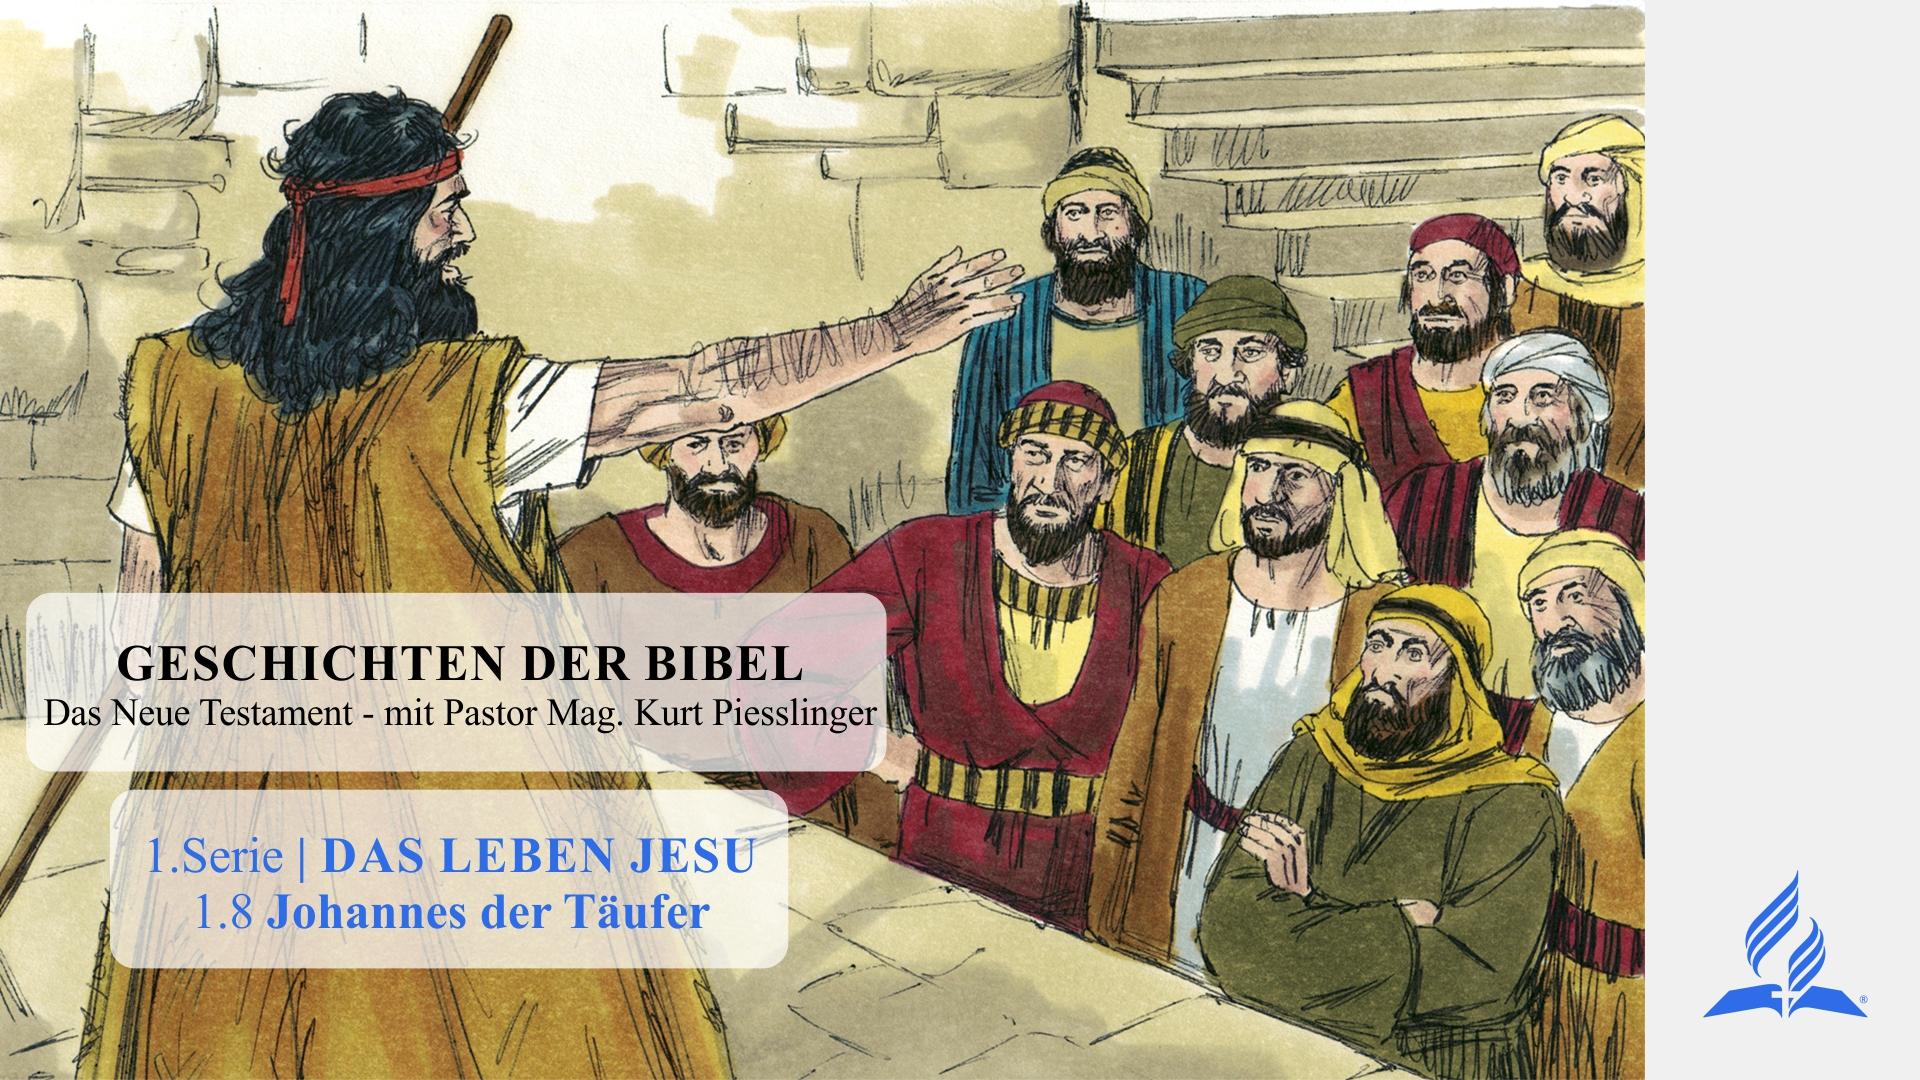 GESCHICHTEN DER BIBEL: 1.8 Johannes der Täufer – 1.DAS LEBEN JESU | Pastor Mag. Kurt Piesslinger